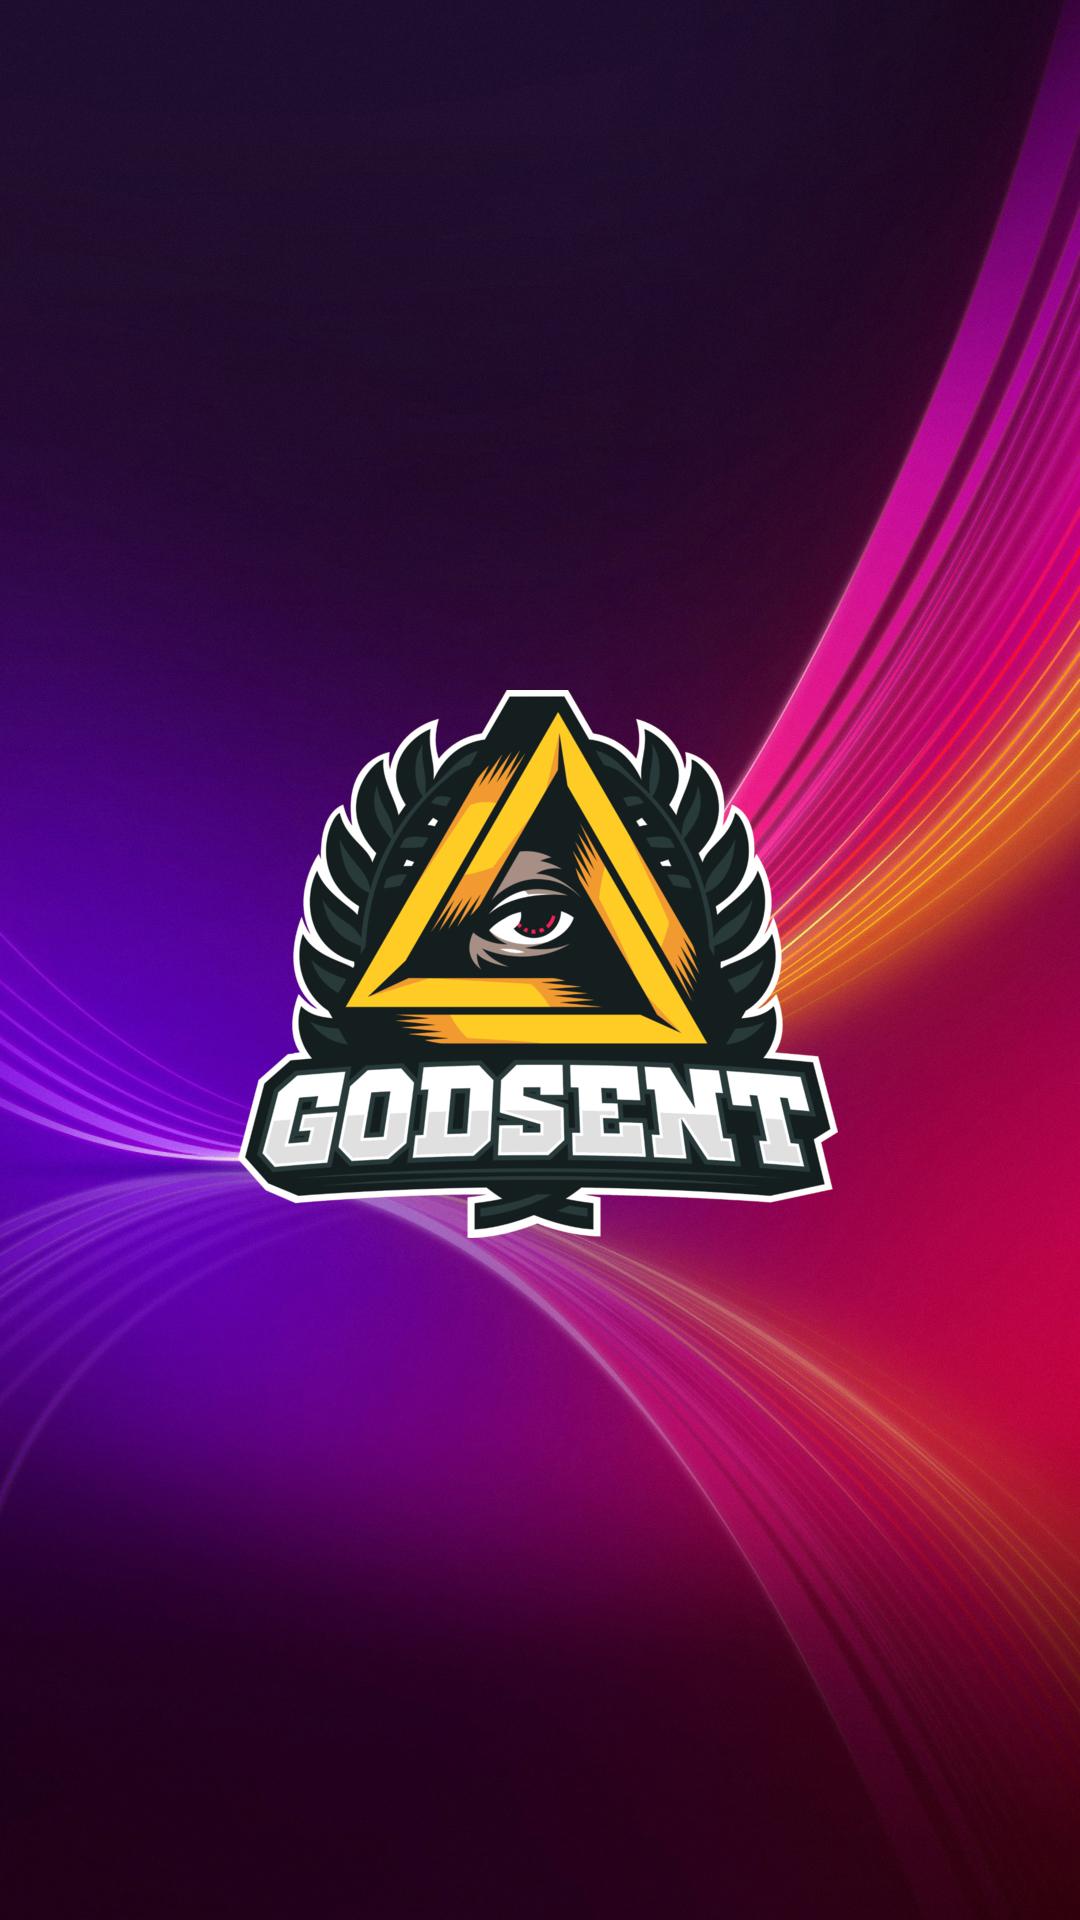 godsent5